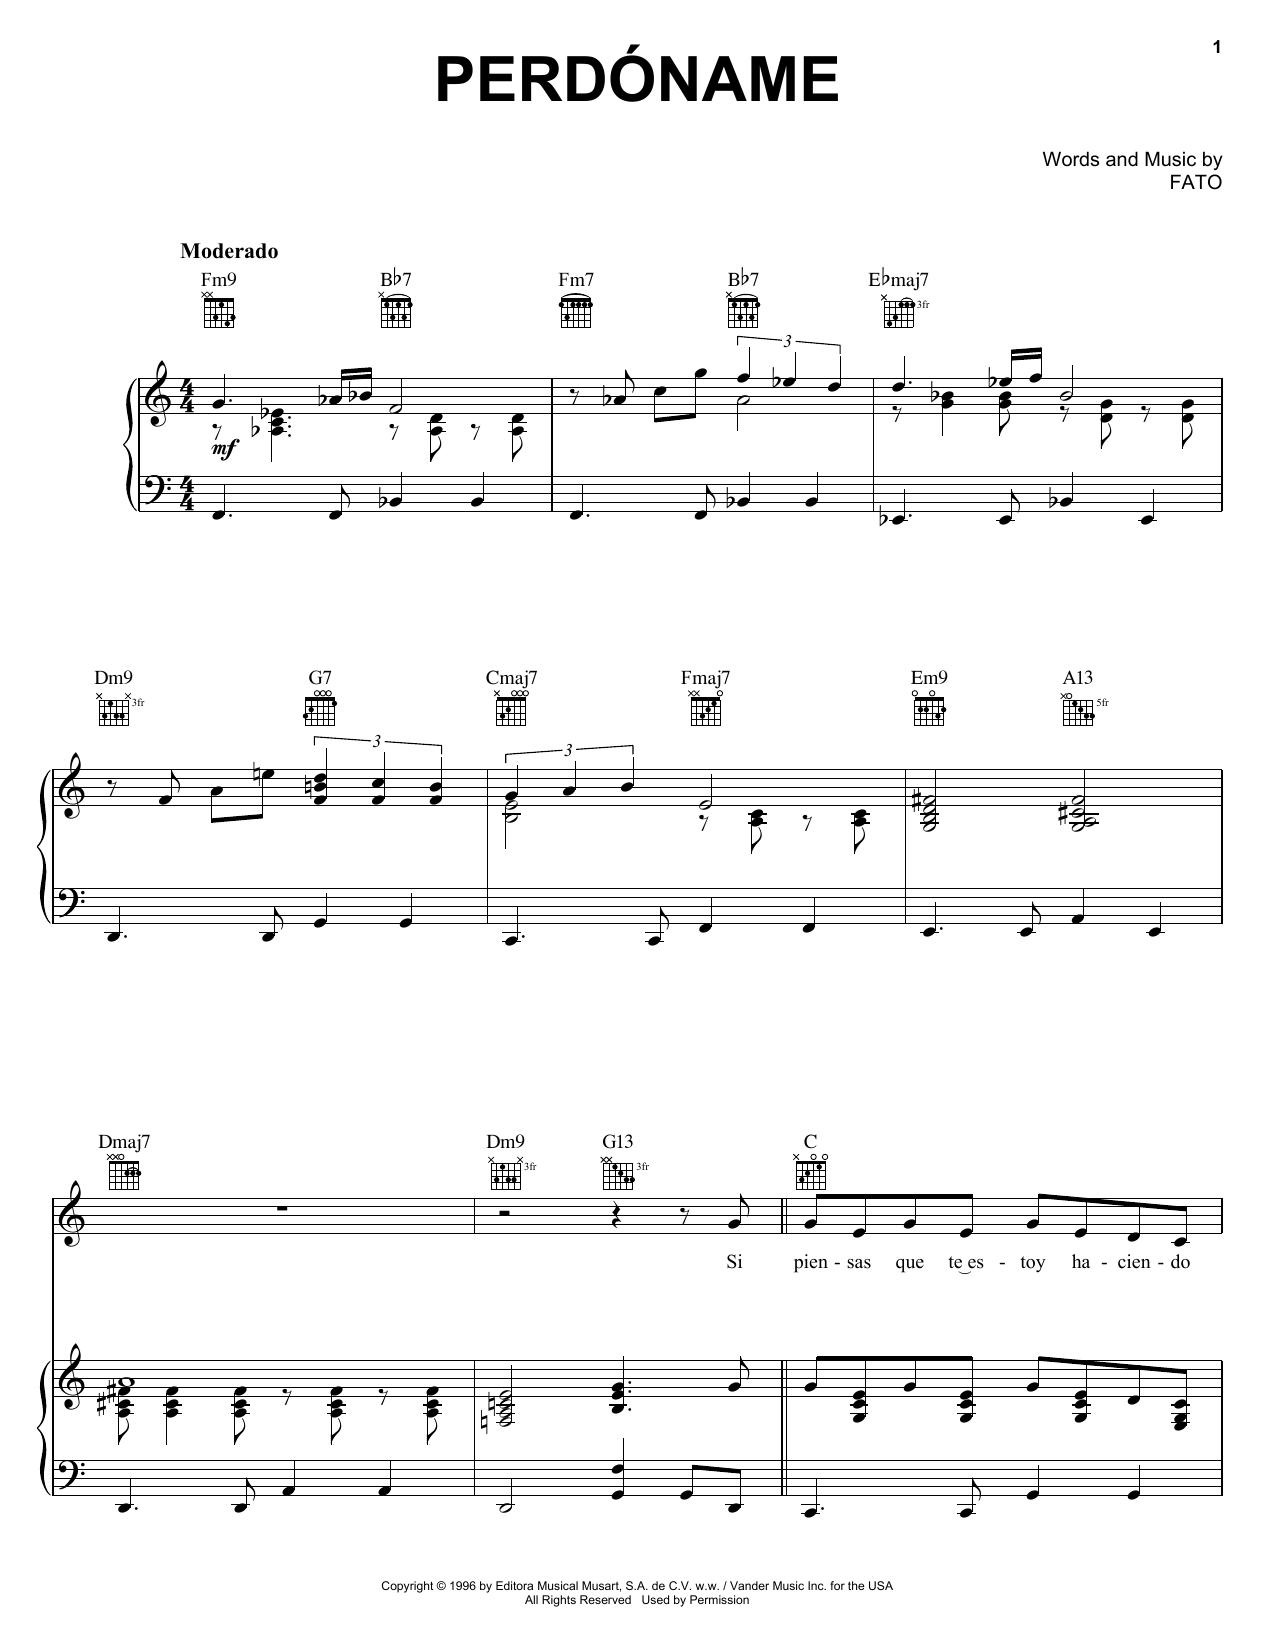 FATO Perdoname sheet music notes and chords. Download Printable PDF.